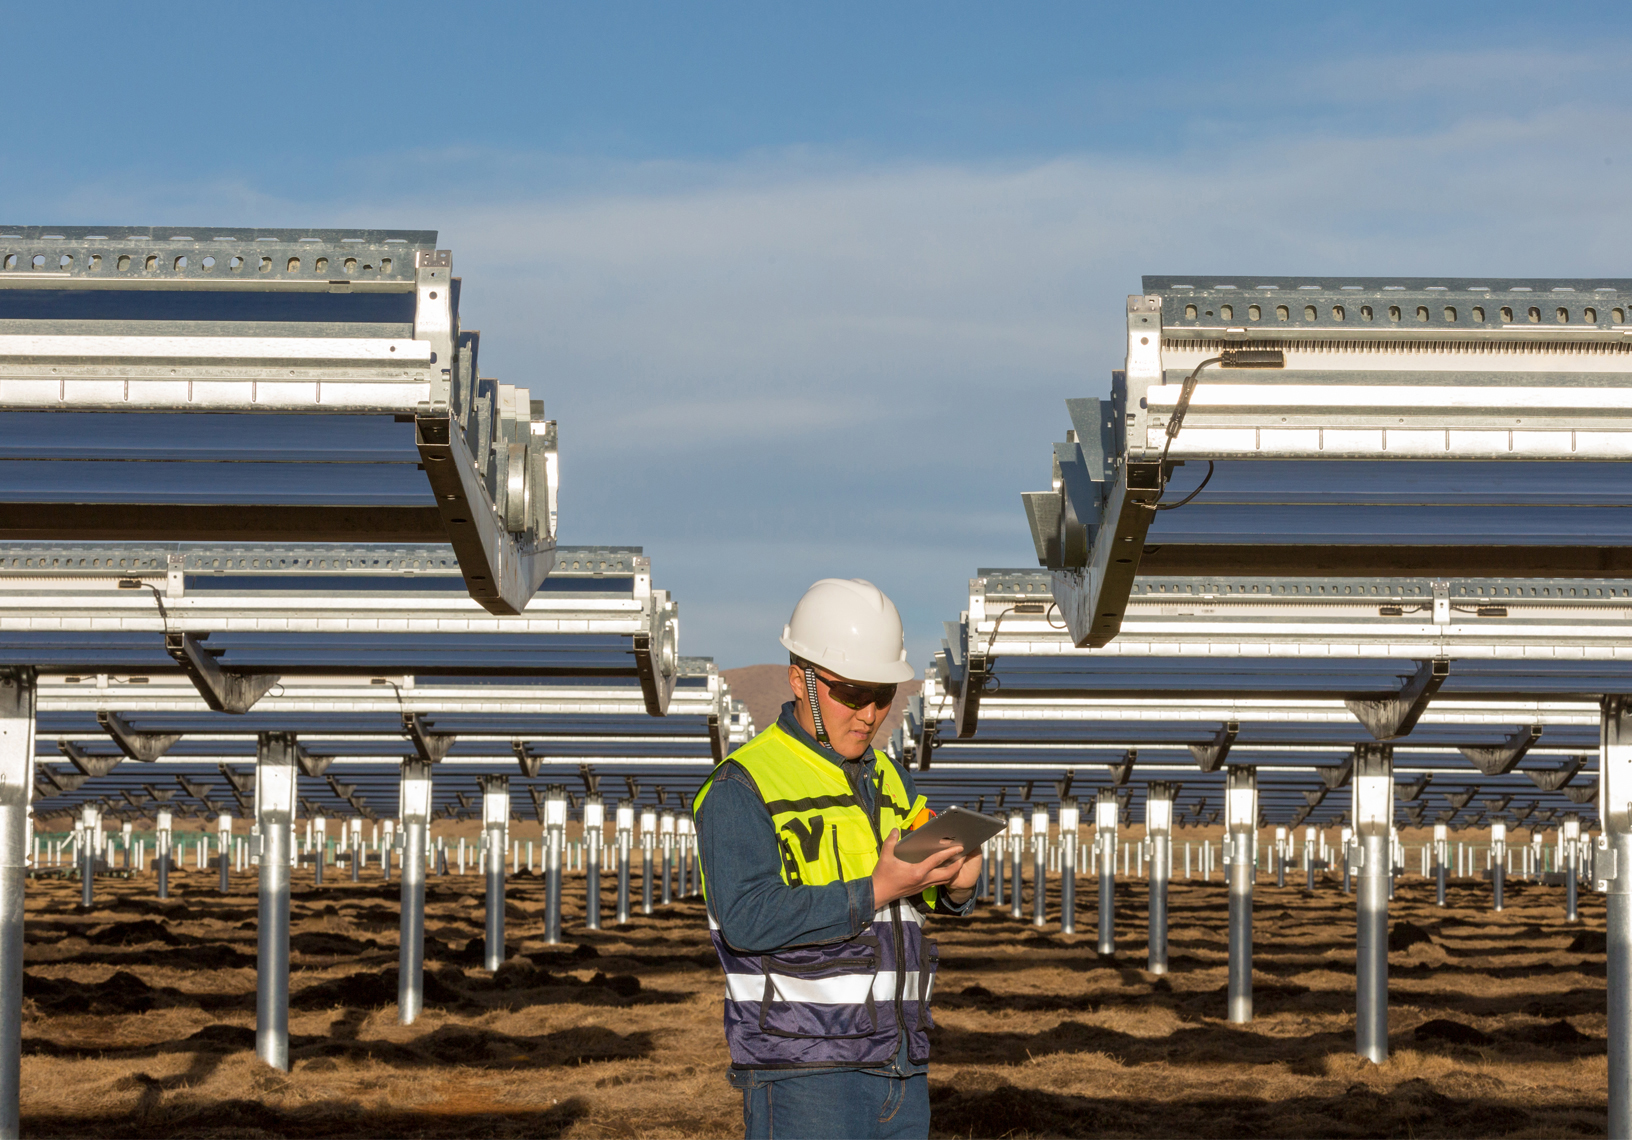 Planta fotovoltaica de Apple en la provincia china de Sichuan